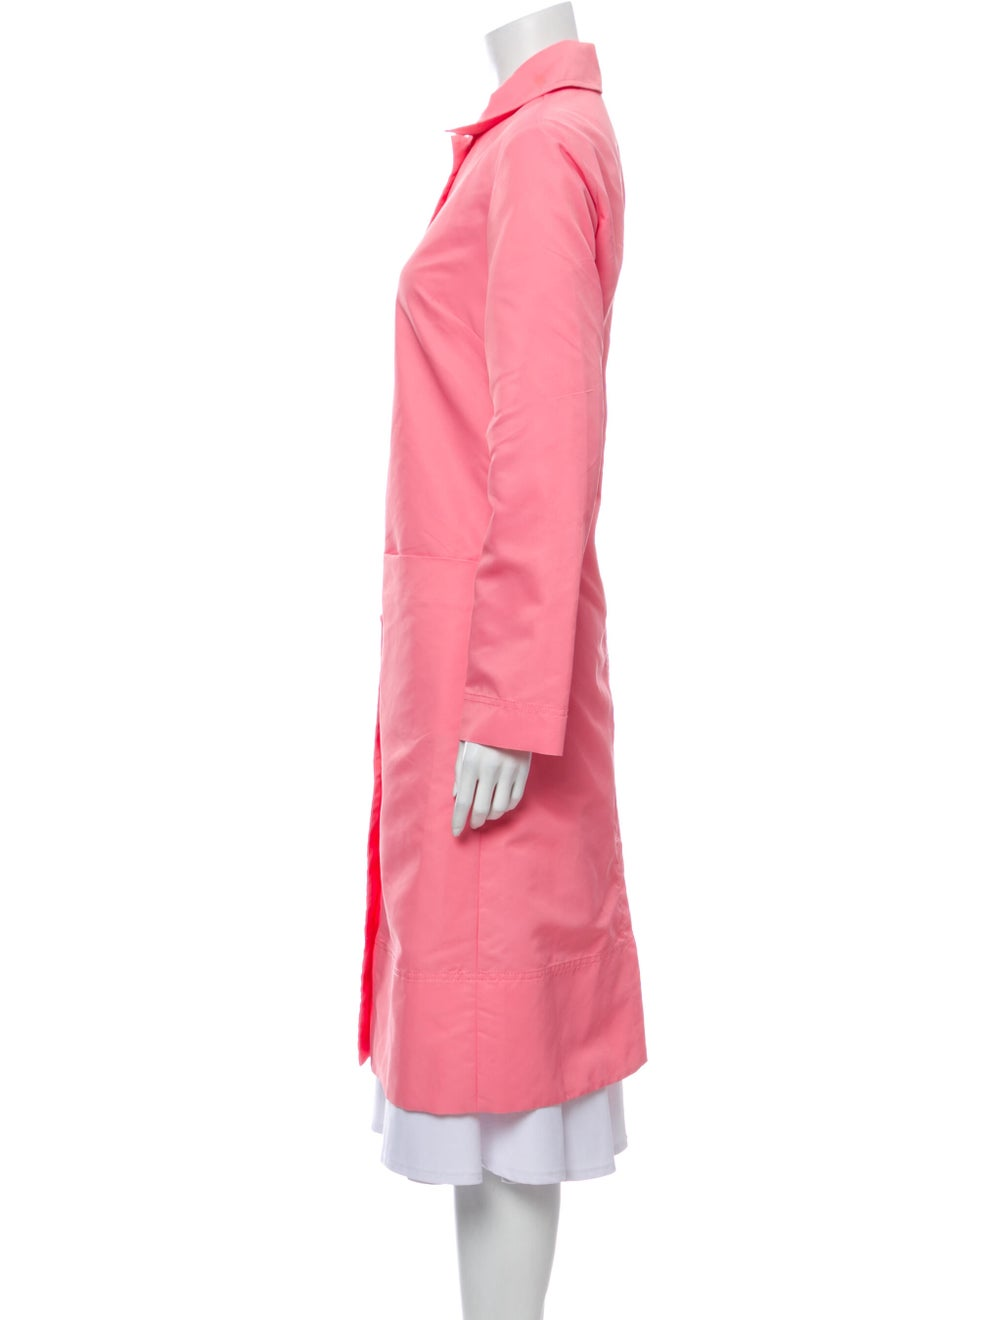 Staud Trench Coat Pink - image 2